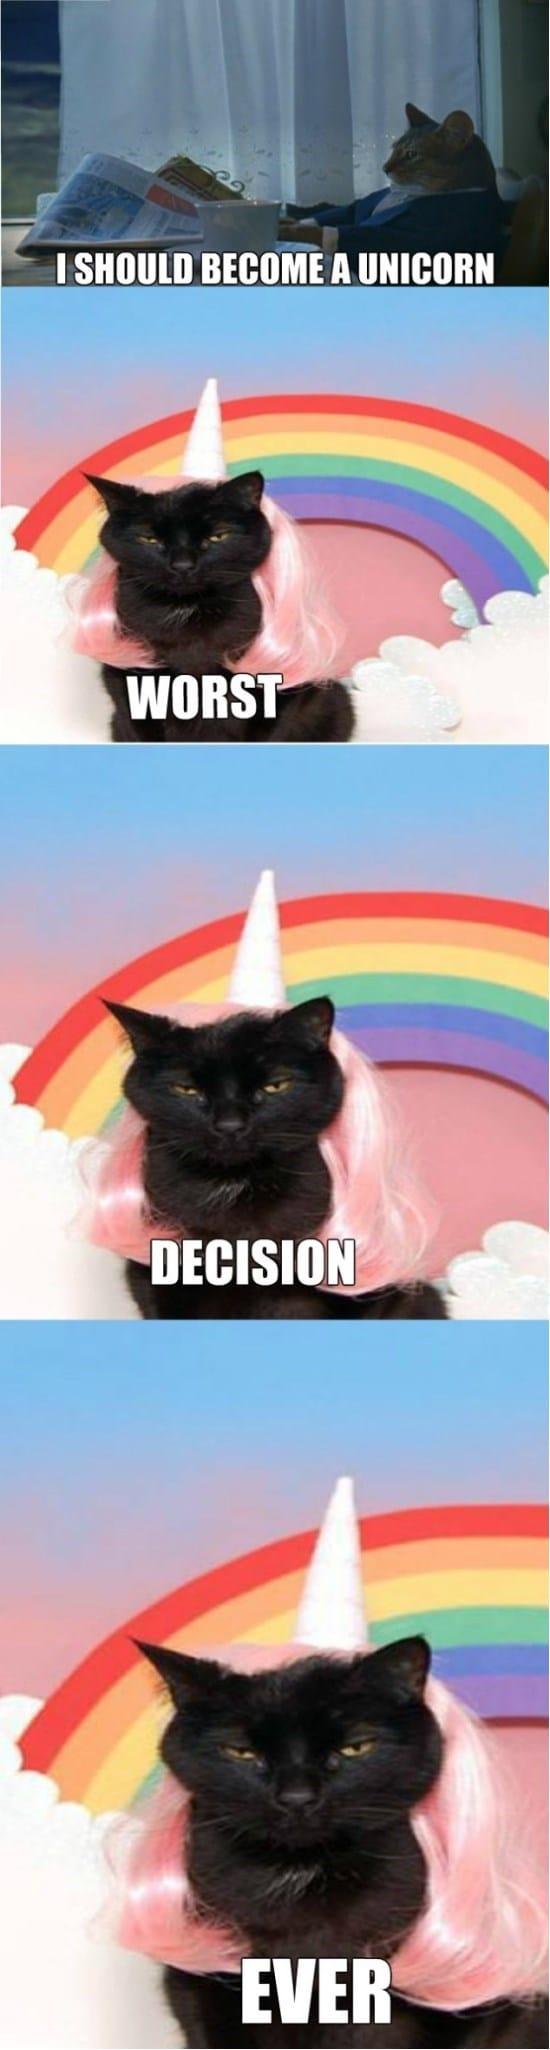 unicorns-funny-meme-gif